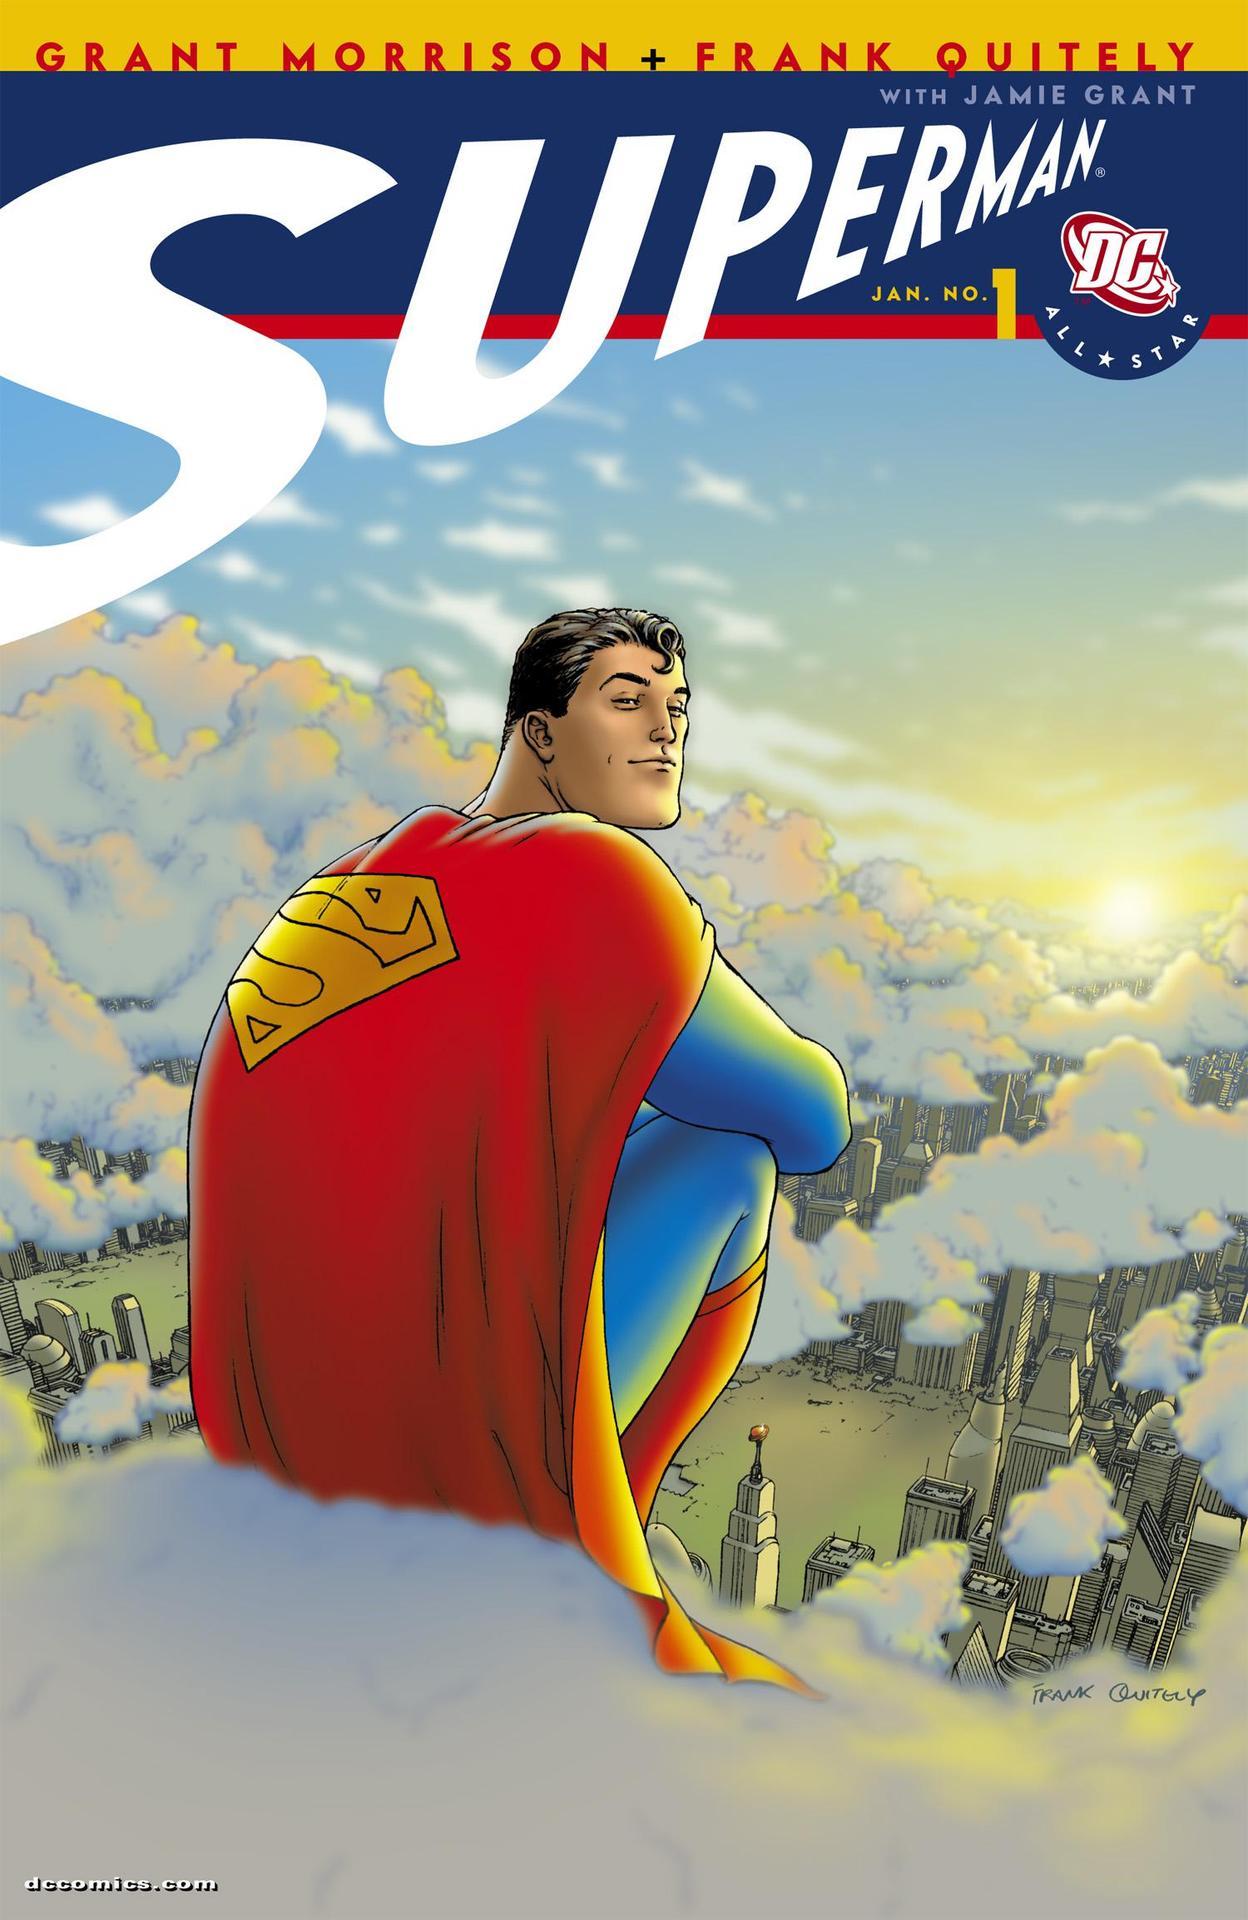 https://vignette.wikia.nocookie.net/marvel_dc/images/2/21/All-Star_Superman_1.jpg/revision/latest?cb=20060221175651